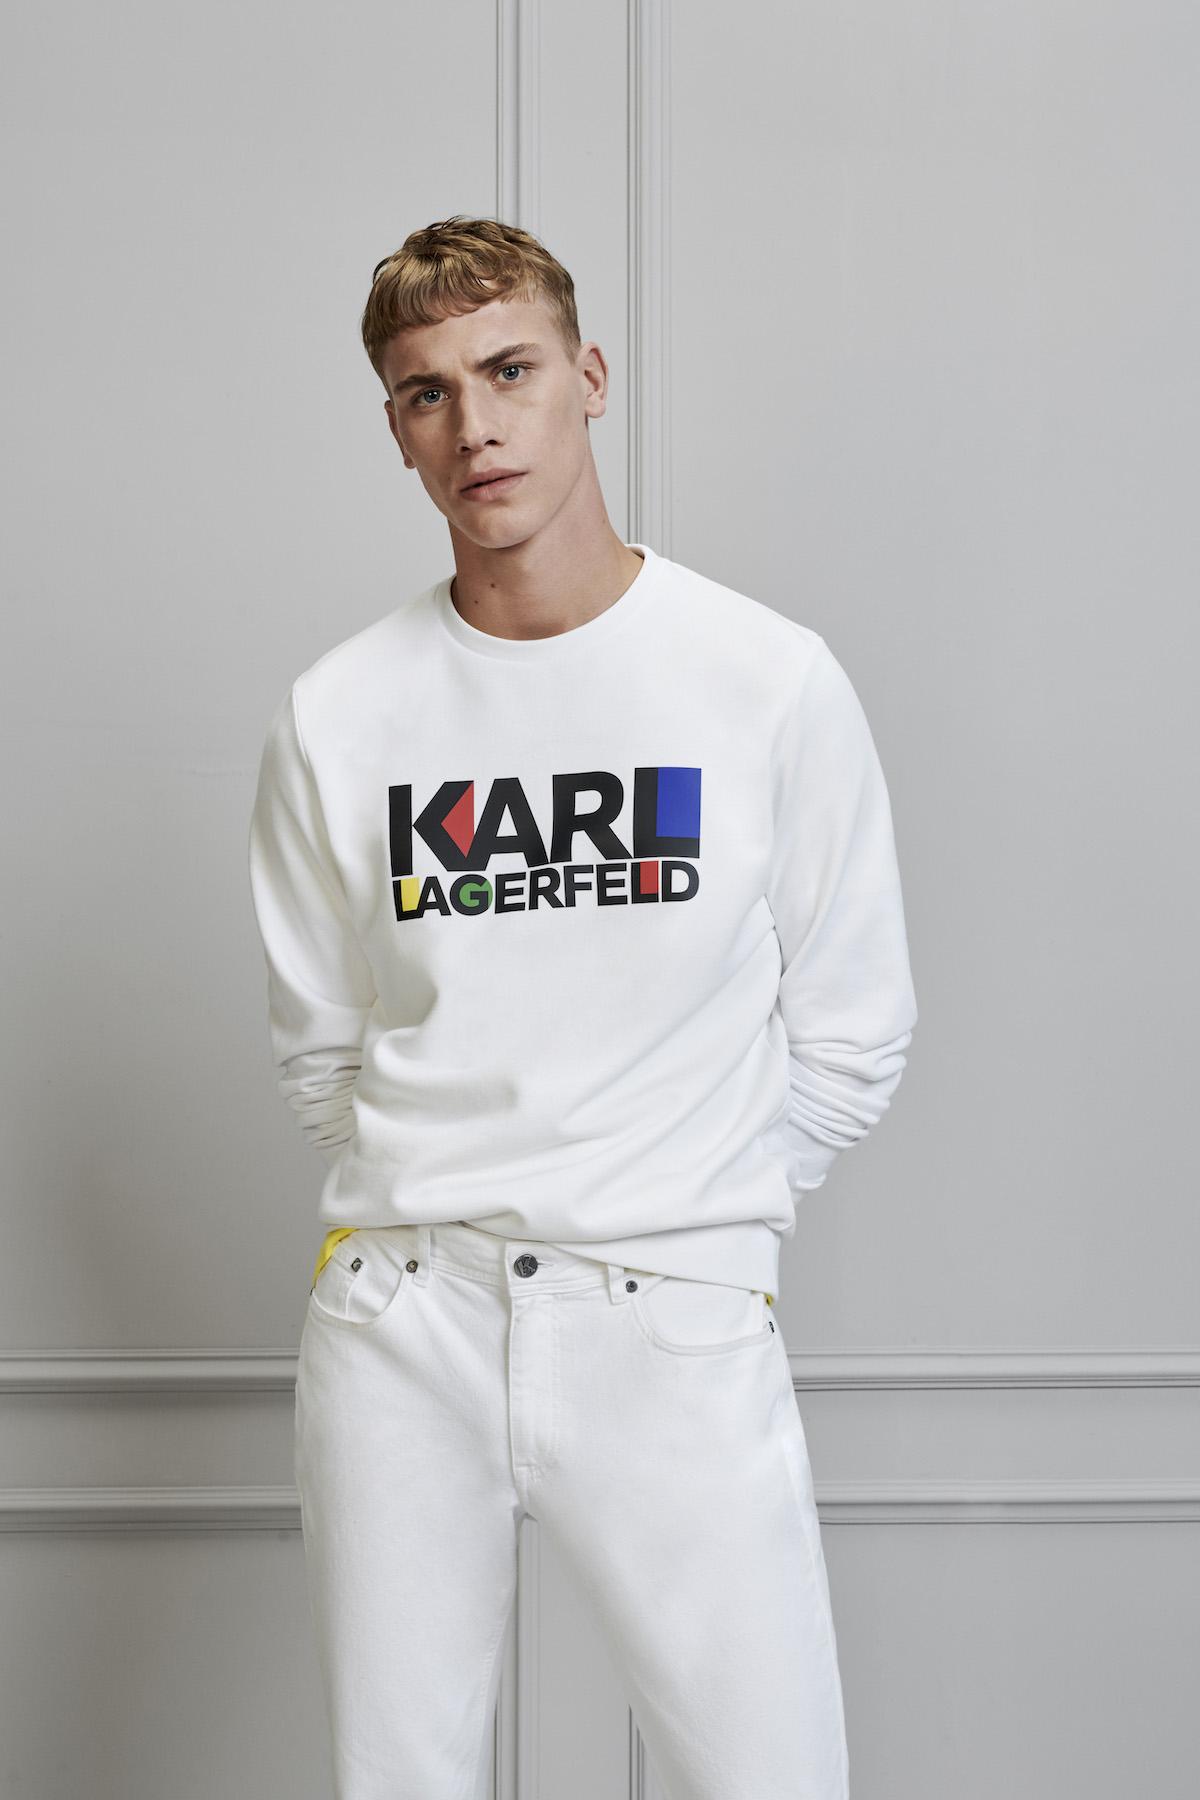 Karl Lagerfeld Unveils Spring/Summer 2020 Menswear Lookbook